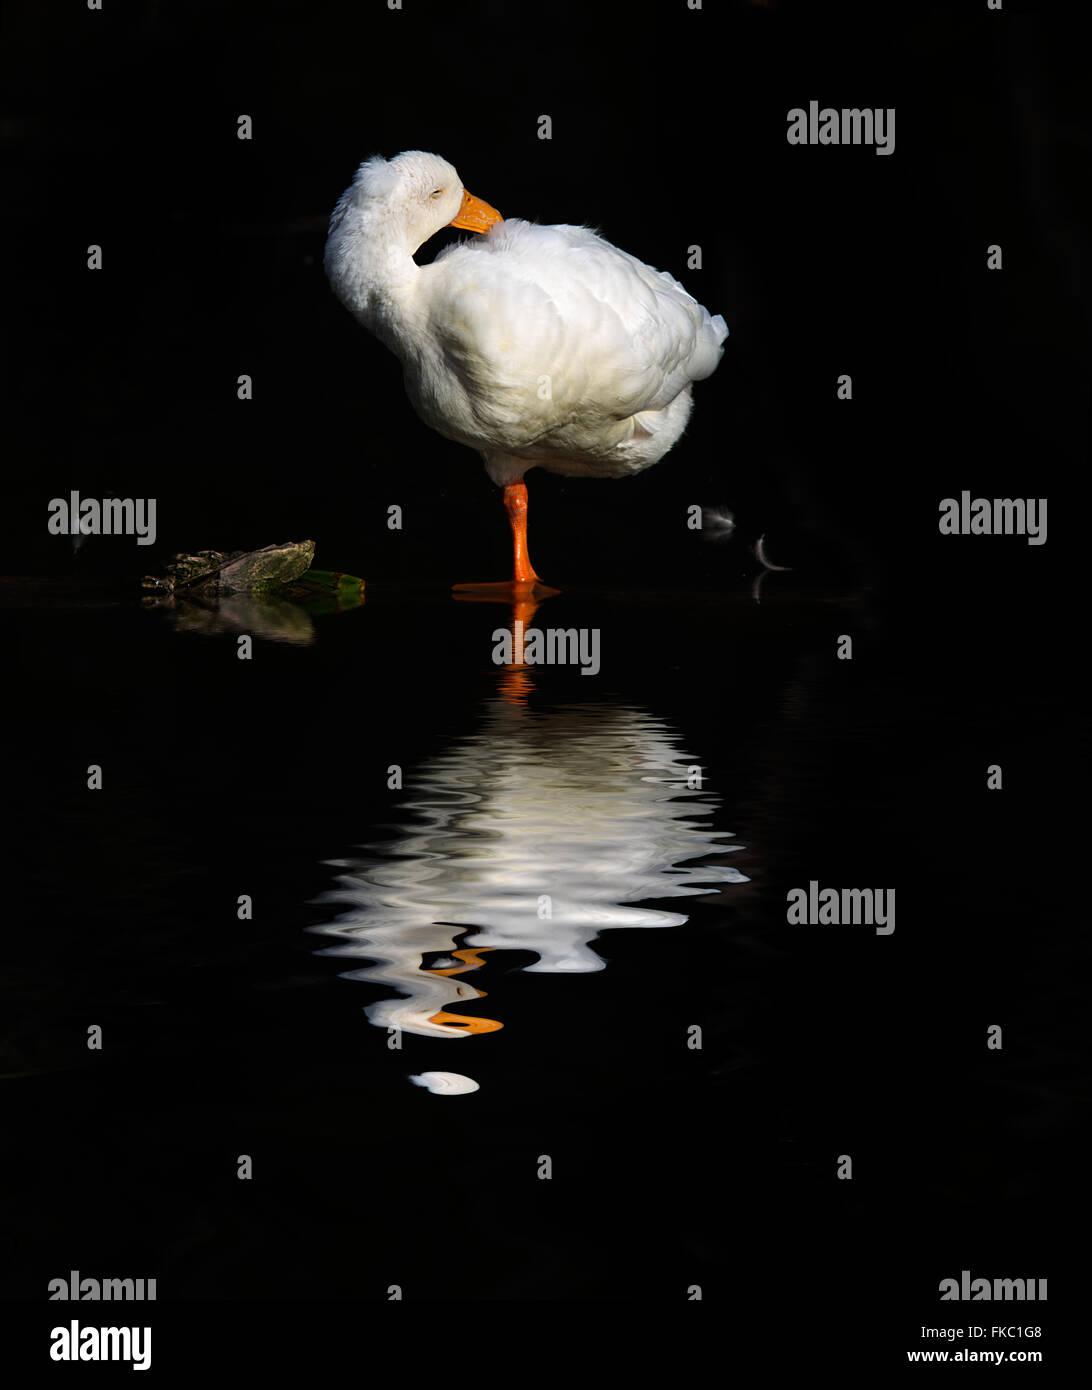 Aylesbury Duck resting. - Stock Image